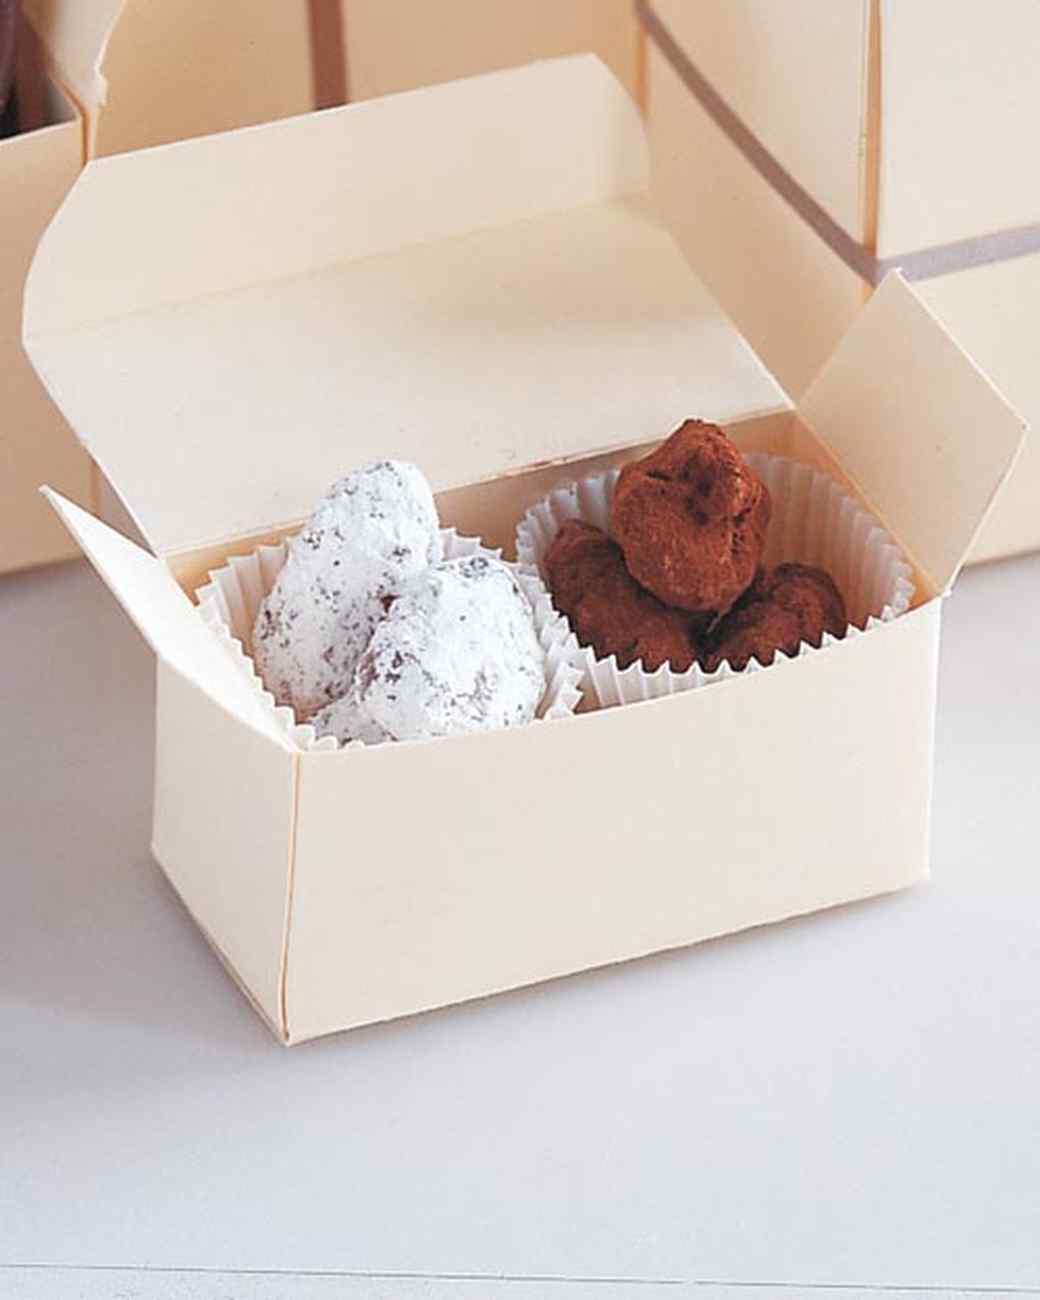 ml711k21_1197_chocolate_covered_almonds.jpg